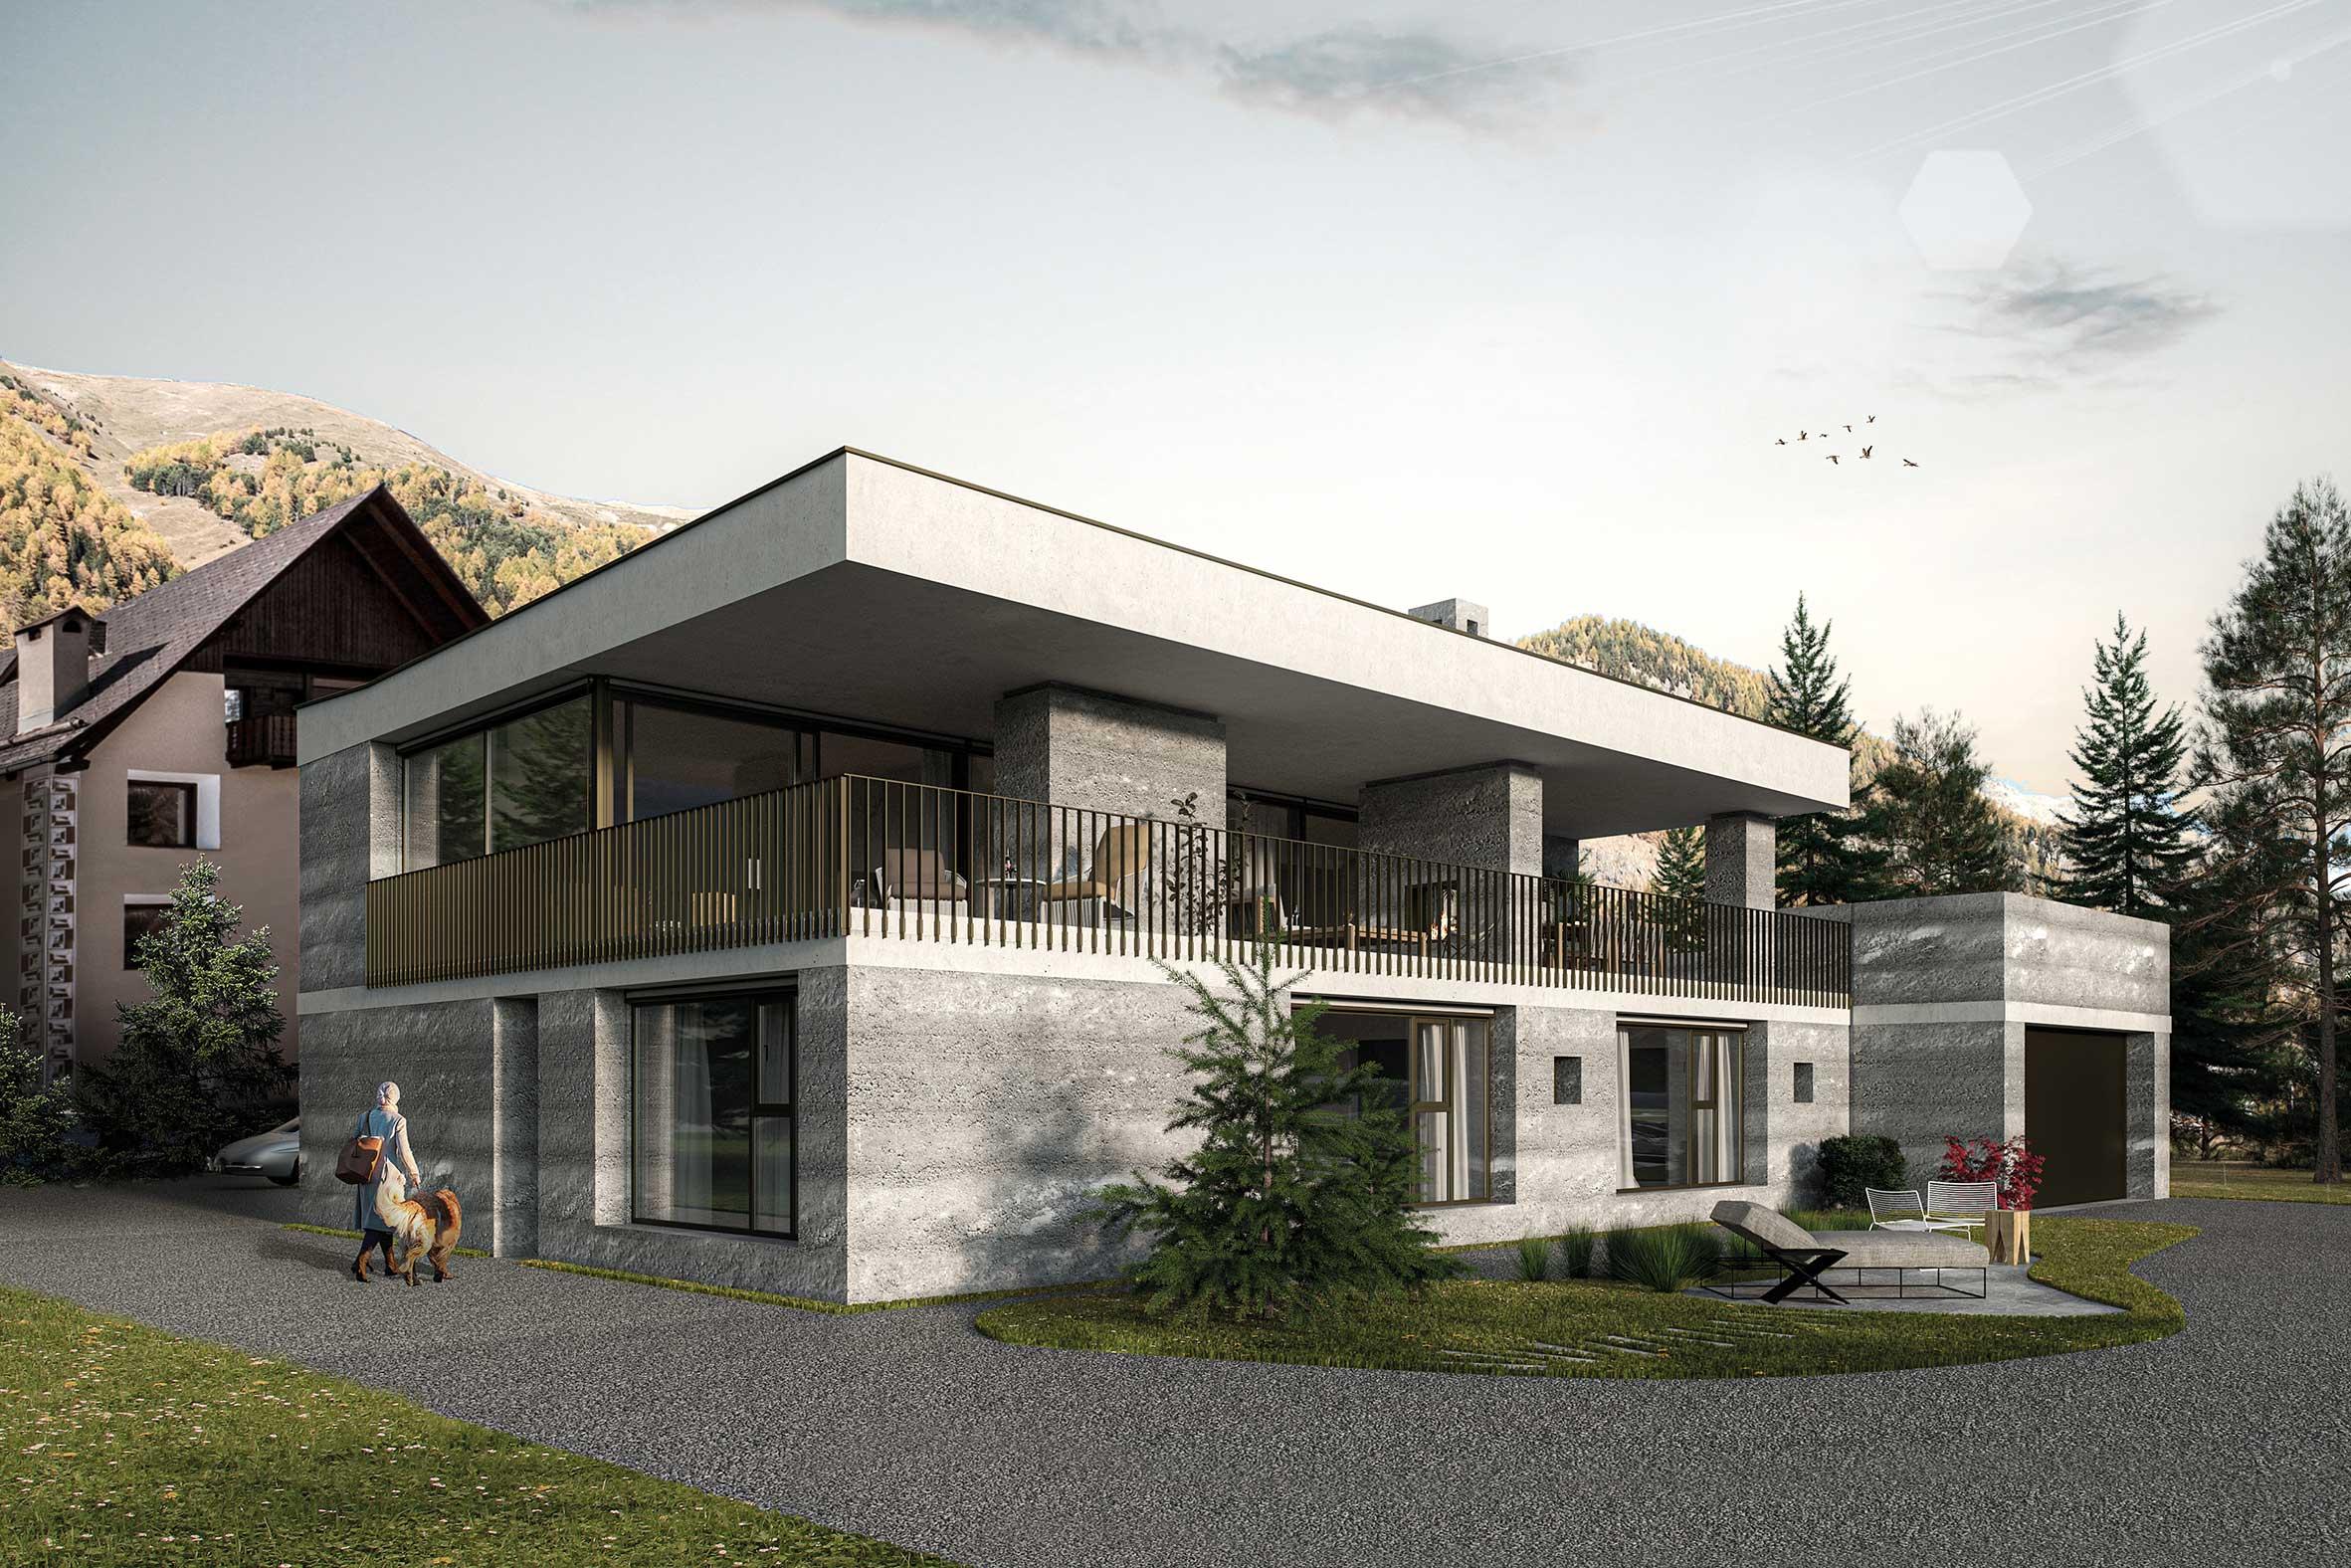 Neubau_Einfamilienhaus_SanBastiaun_Samedan_thumb5